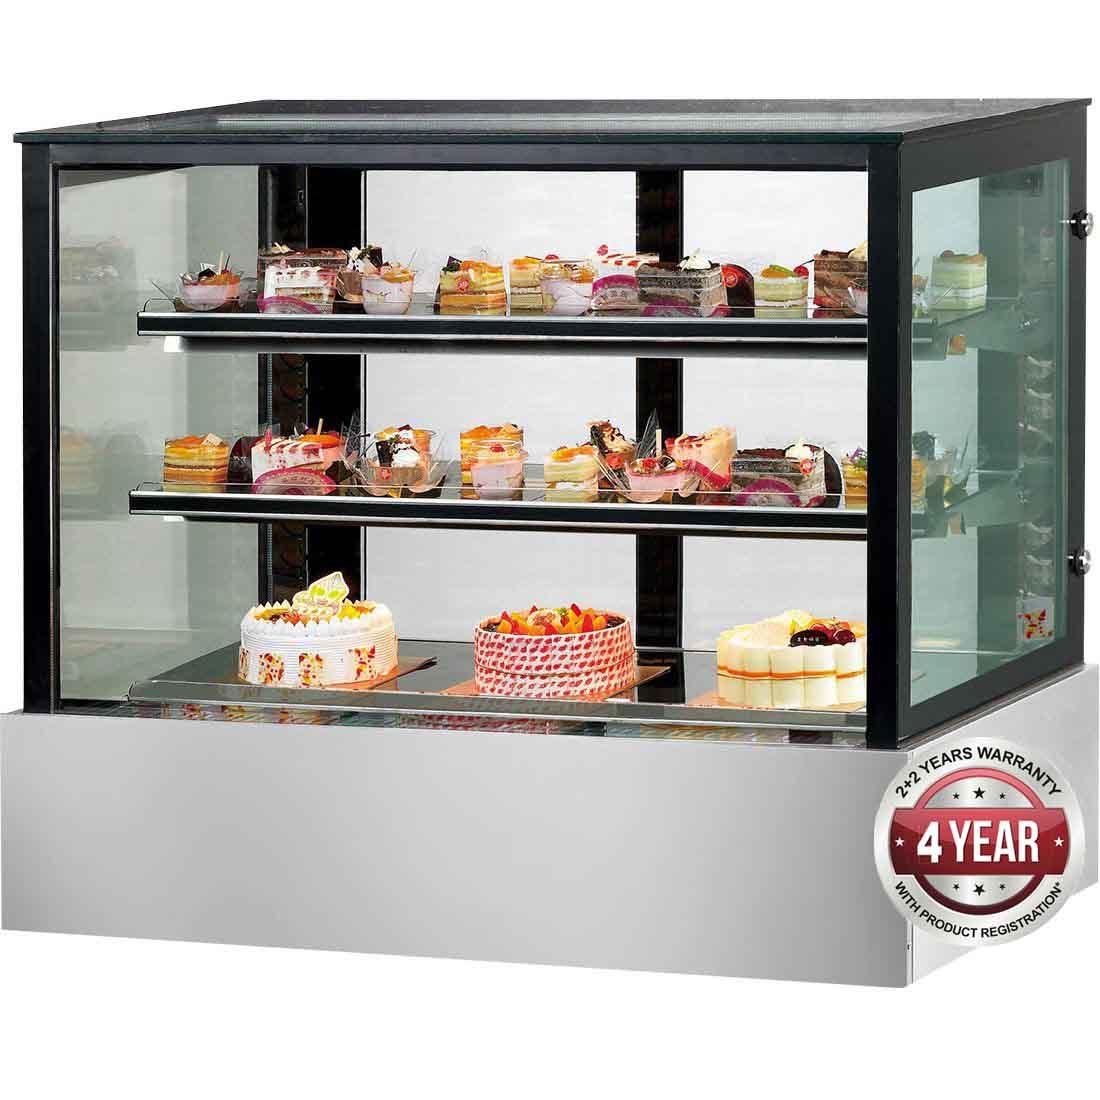 SSU150-2XB Black Trim Square Glass Cake Display 2 Shelves 1500x700x1100